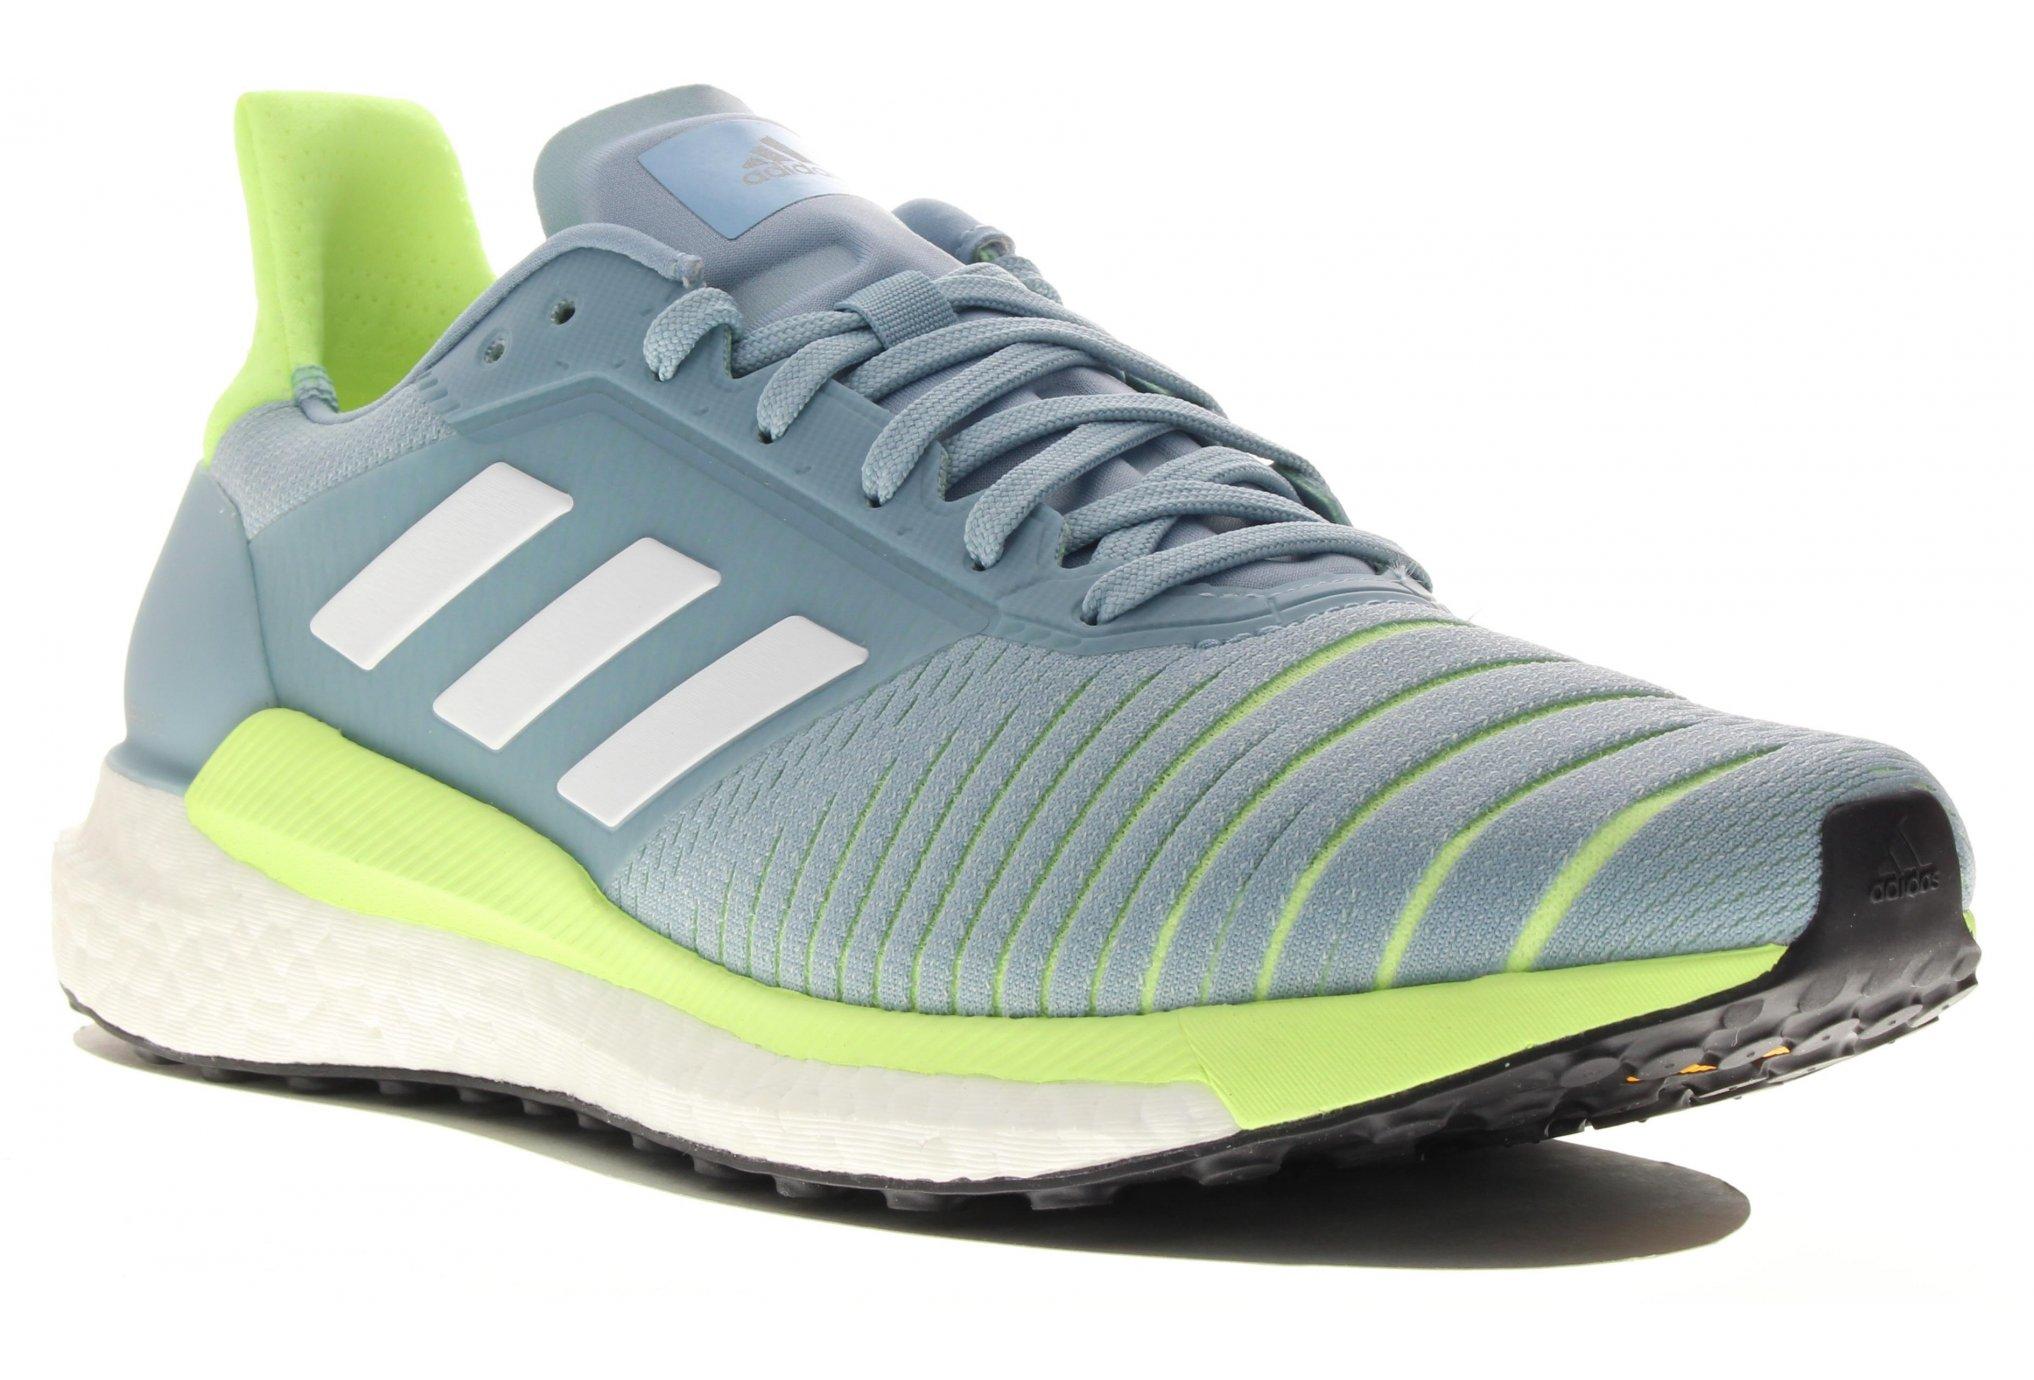 adidas Solar Glide Chaussures running femme